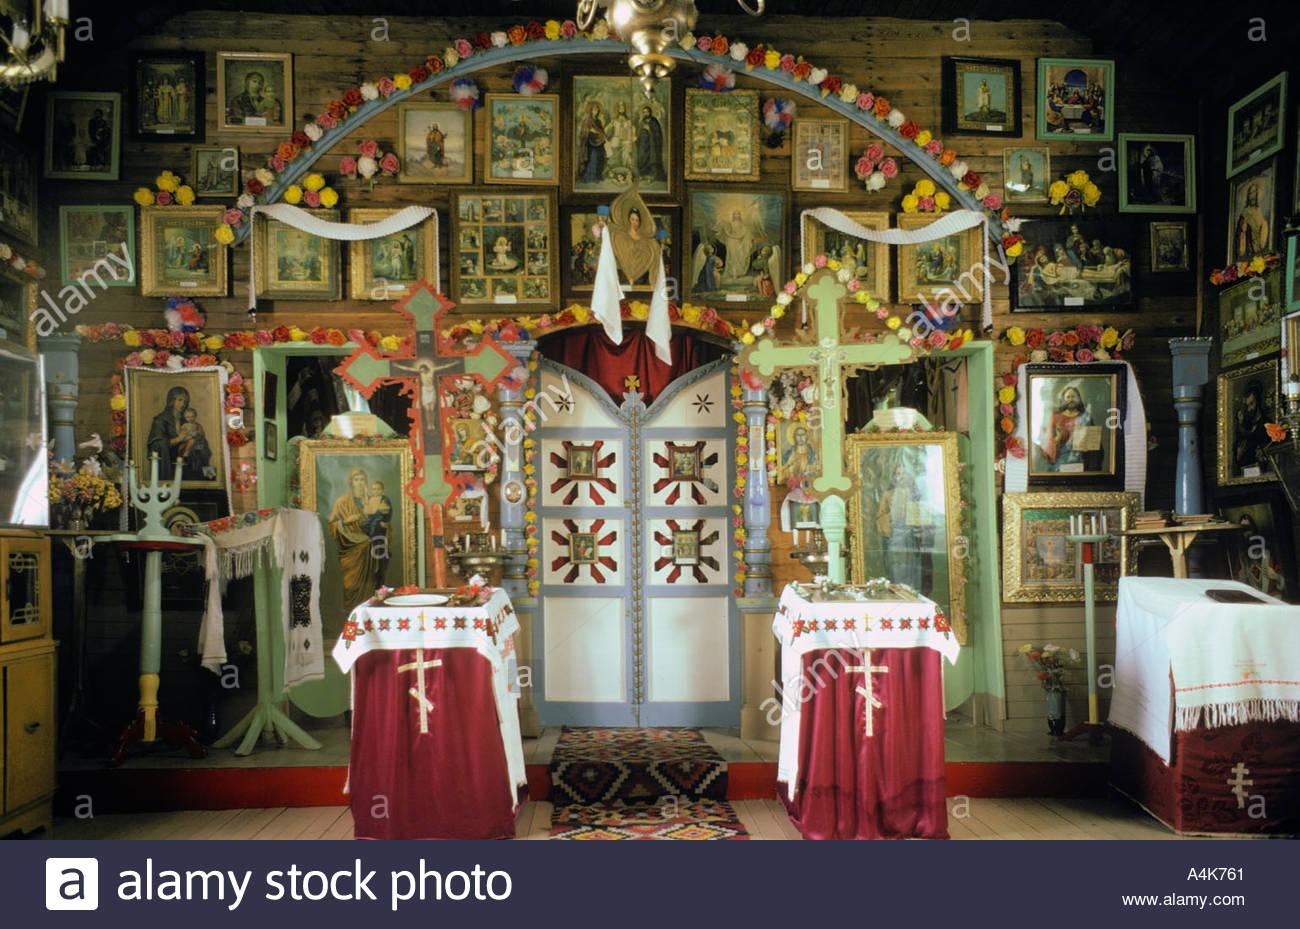 Shandrow Museum The first Greek Orthodox Church in Alberta Willington Alberta Canada - Stock Image